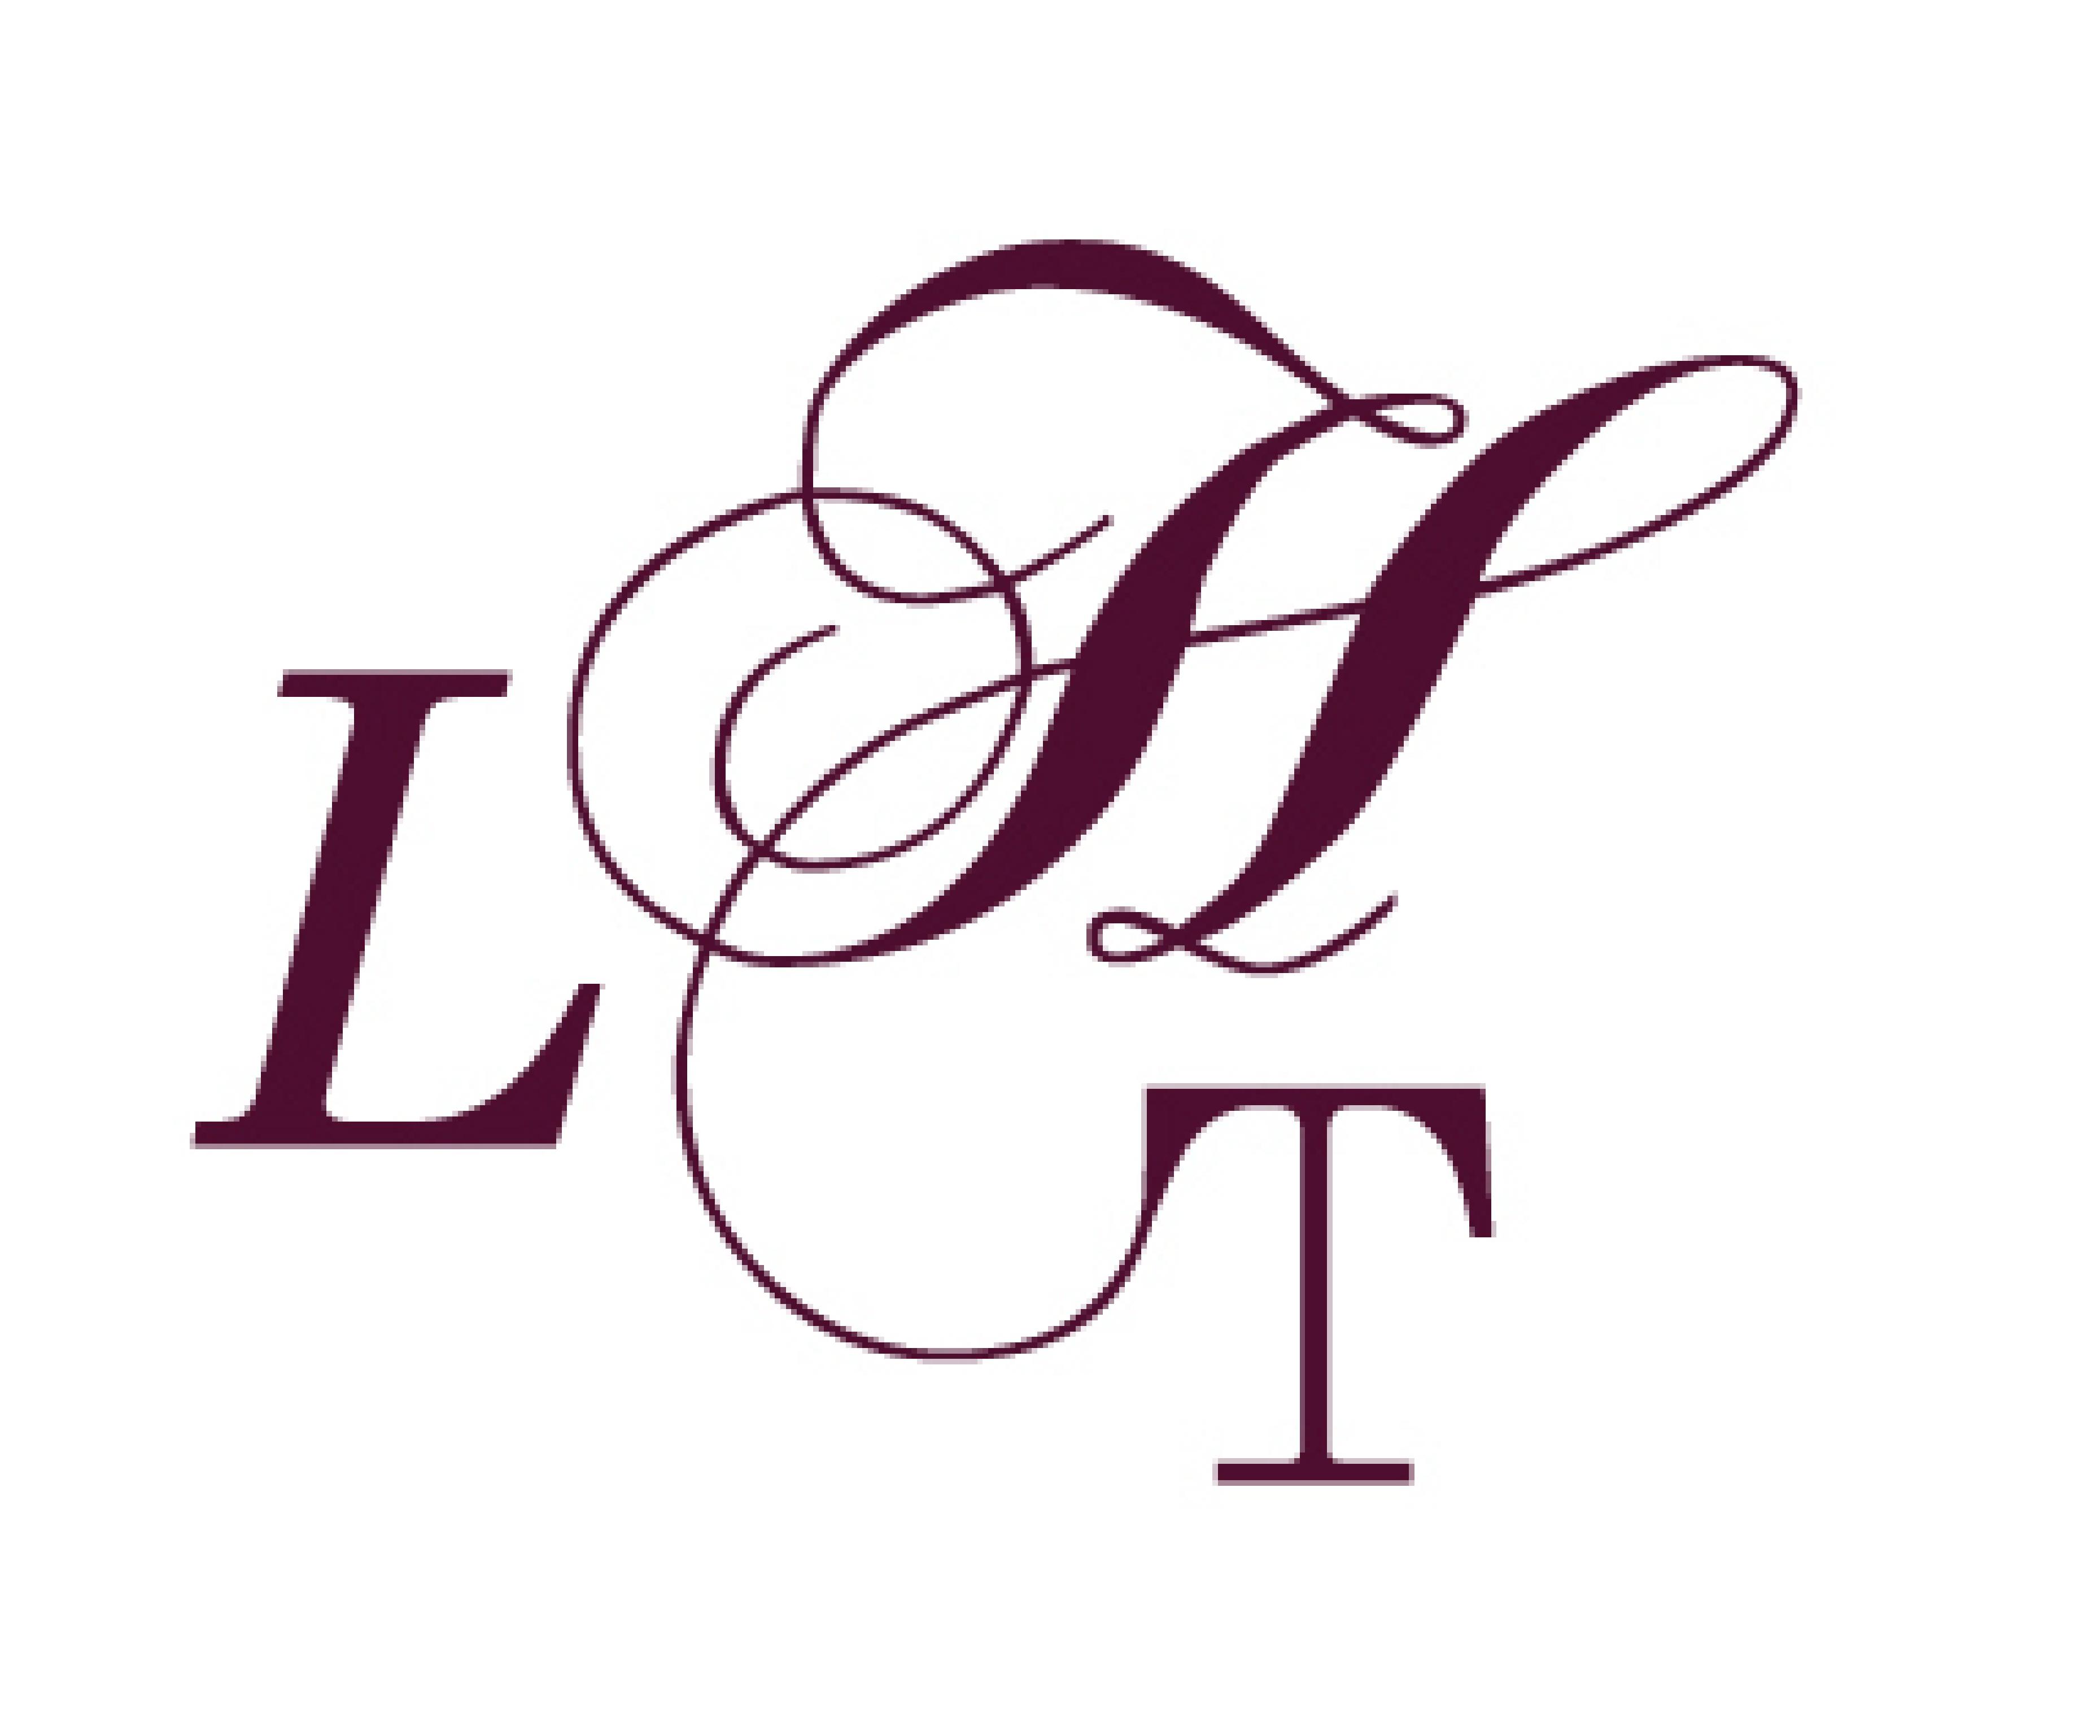 logo lycee hotelier touquet 2